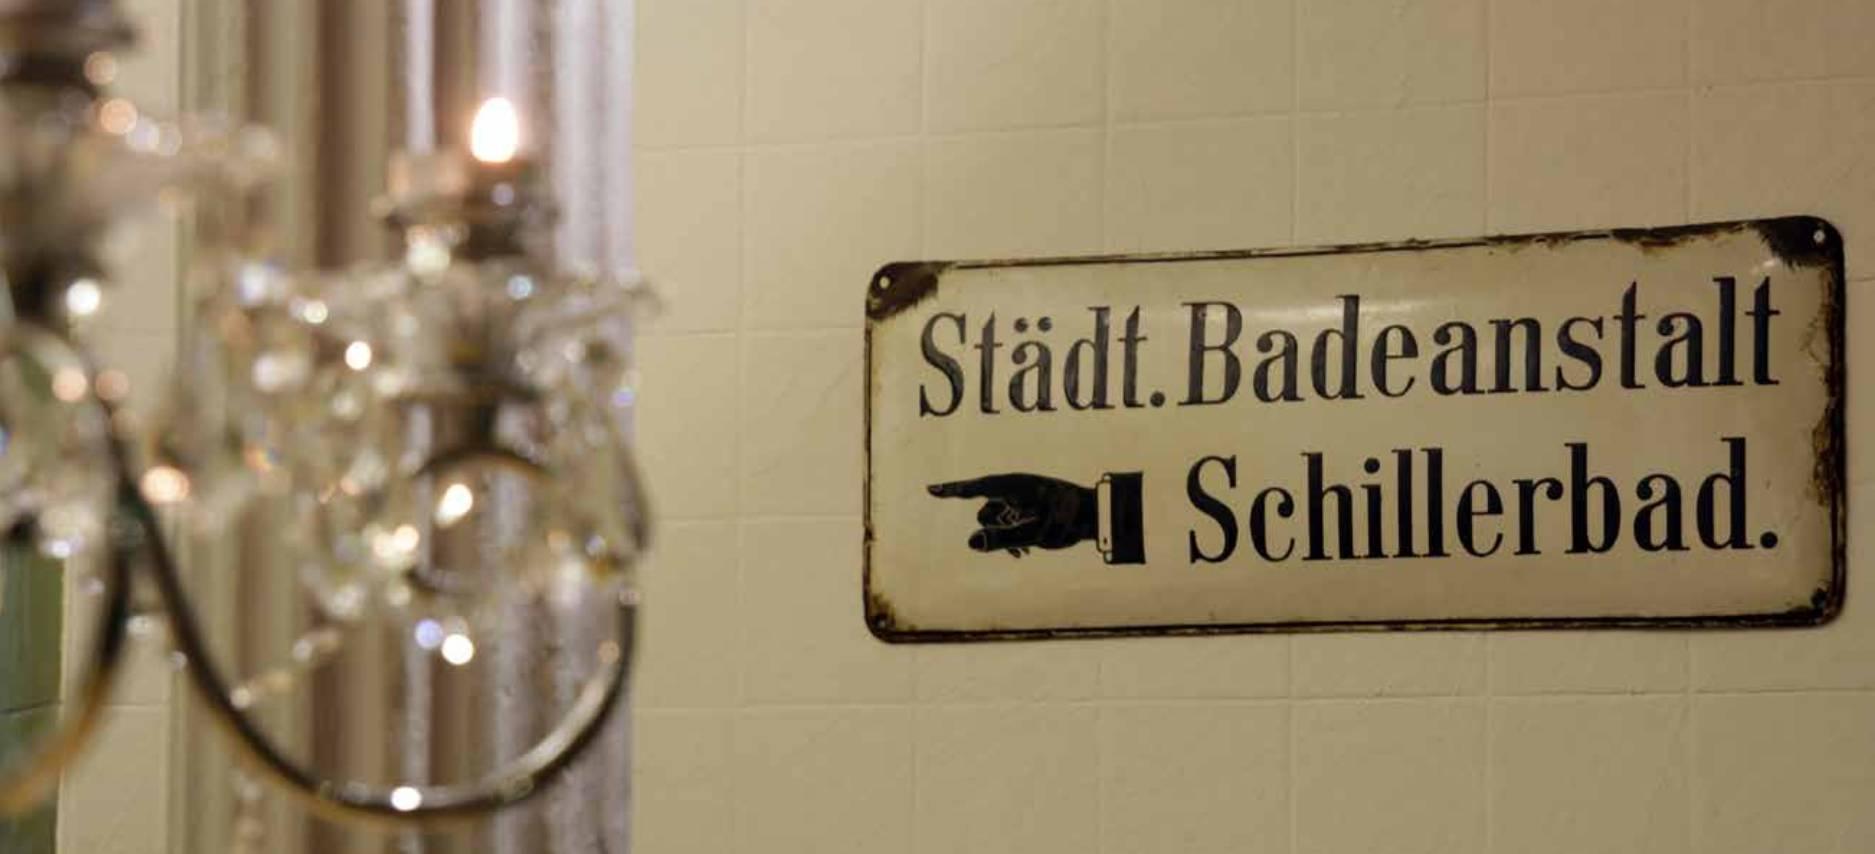 Schillerbad_foto